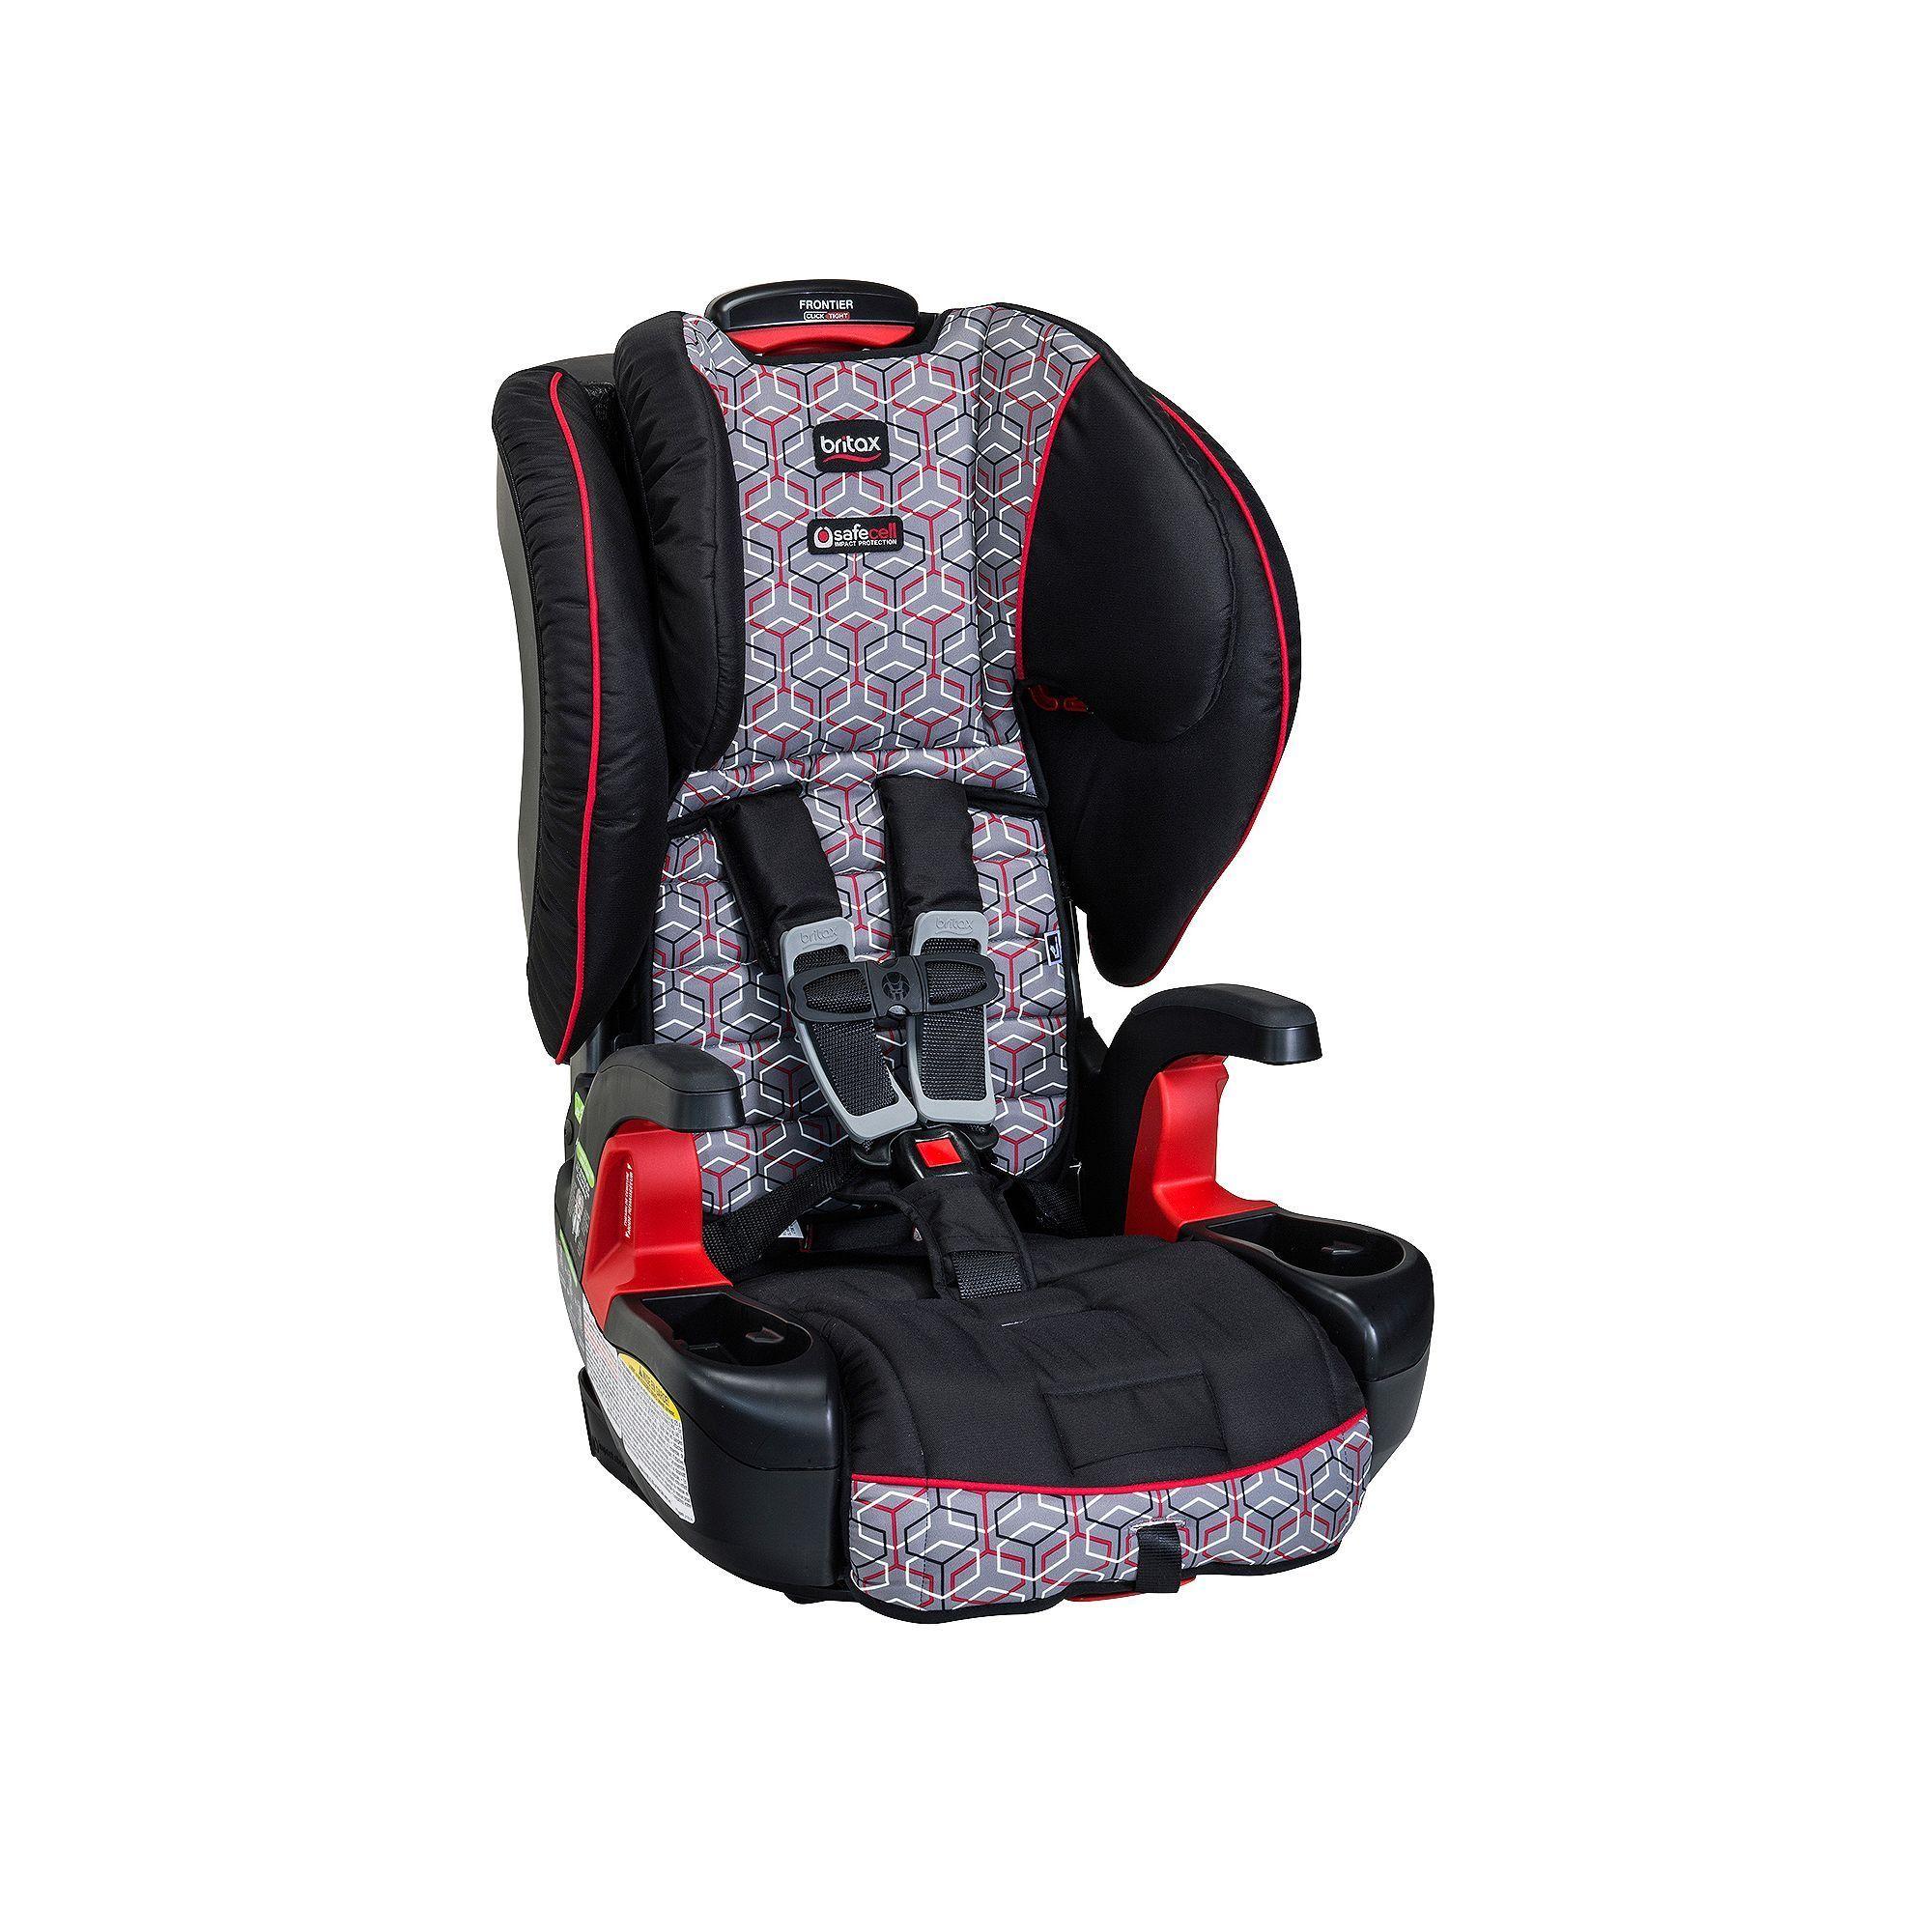 Britax Frontier G1 1 Click Harness 2 Booster Car Seat Multicolor